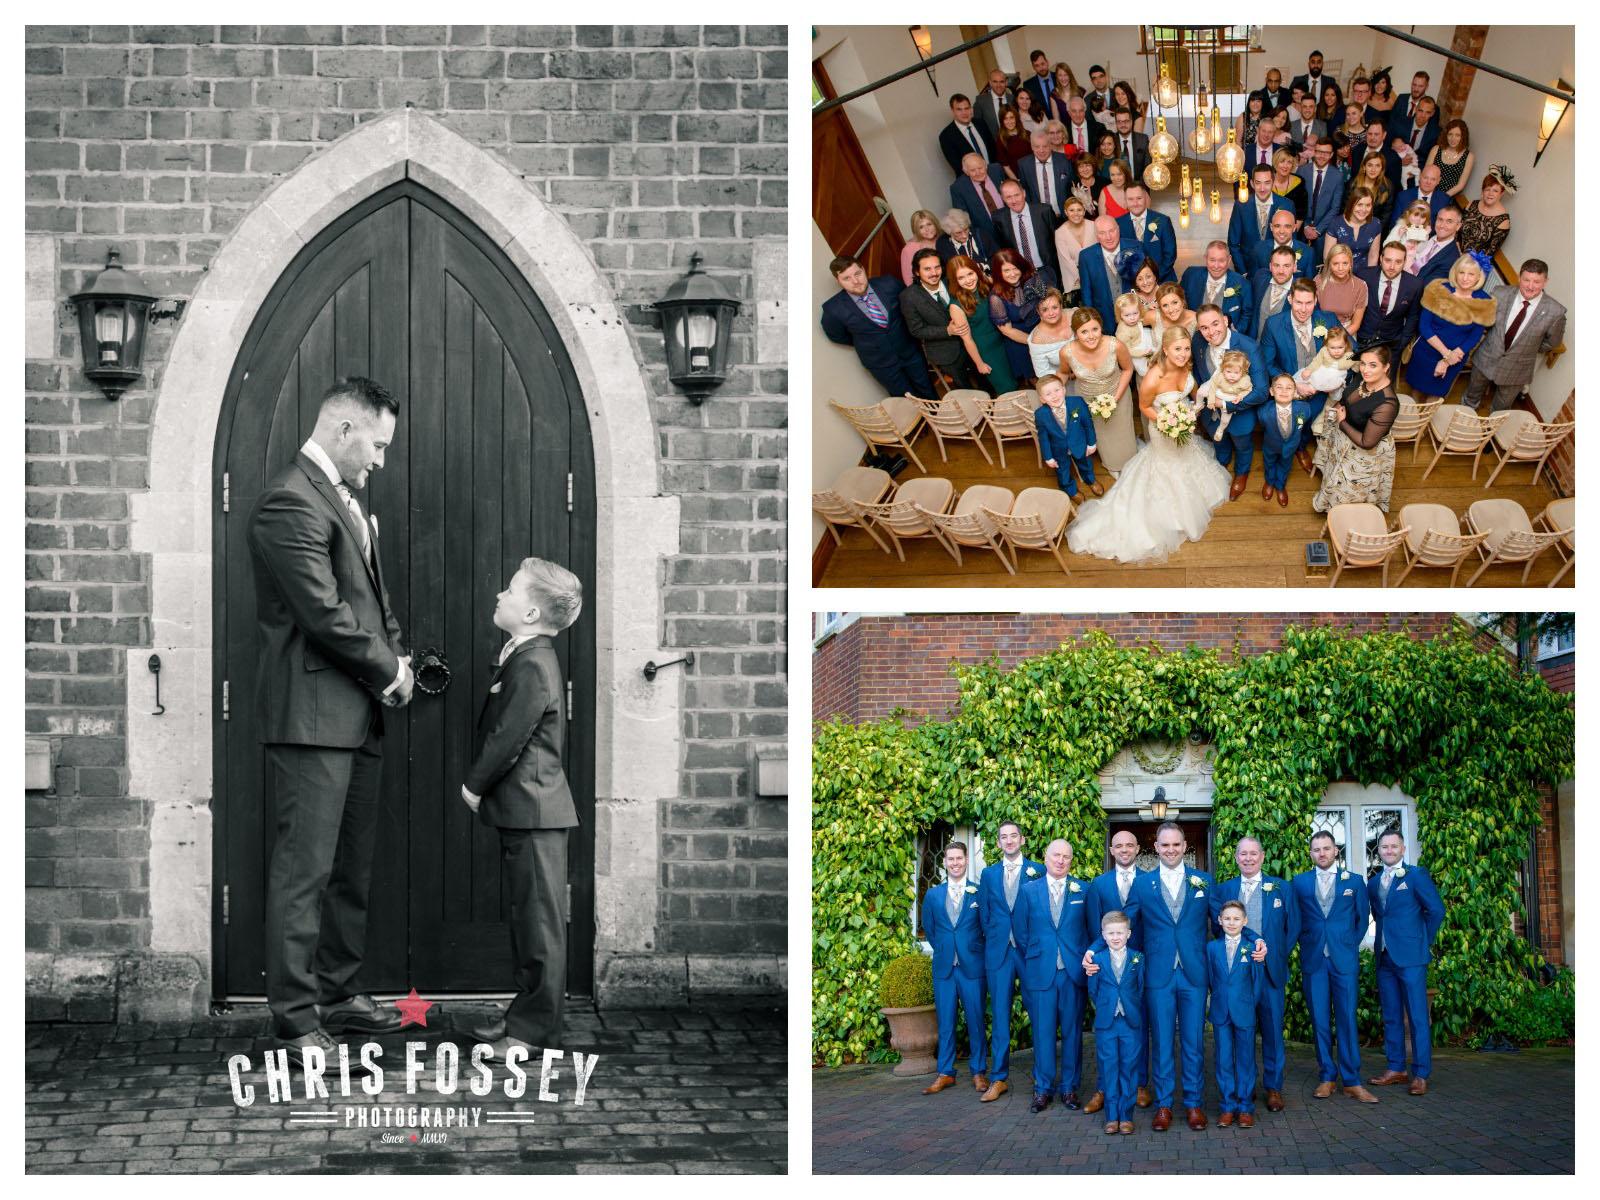 Nuthurst Grange Hotel Gorgeous Natural Wedding Photography Warwickshire Chris Fossey B94 5NL 13